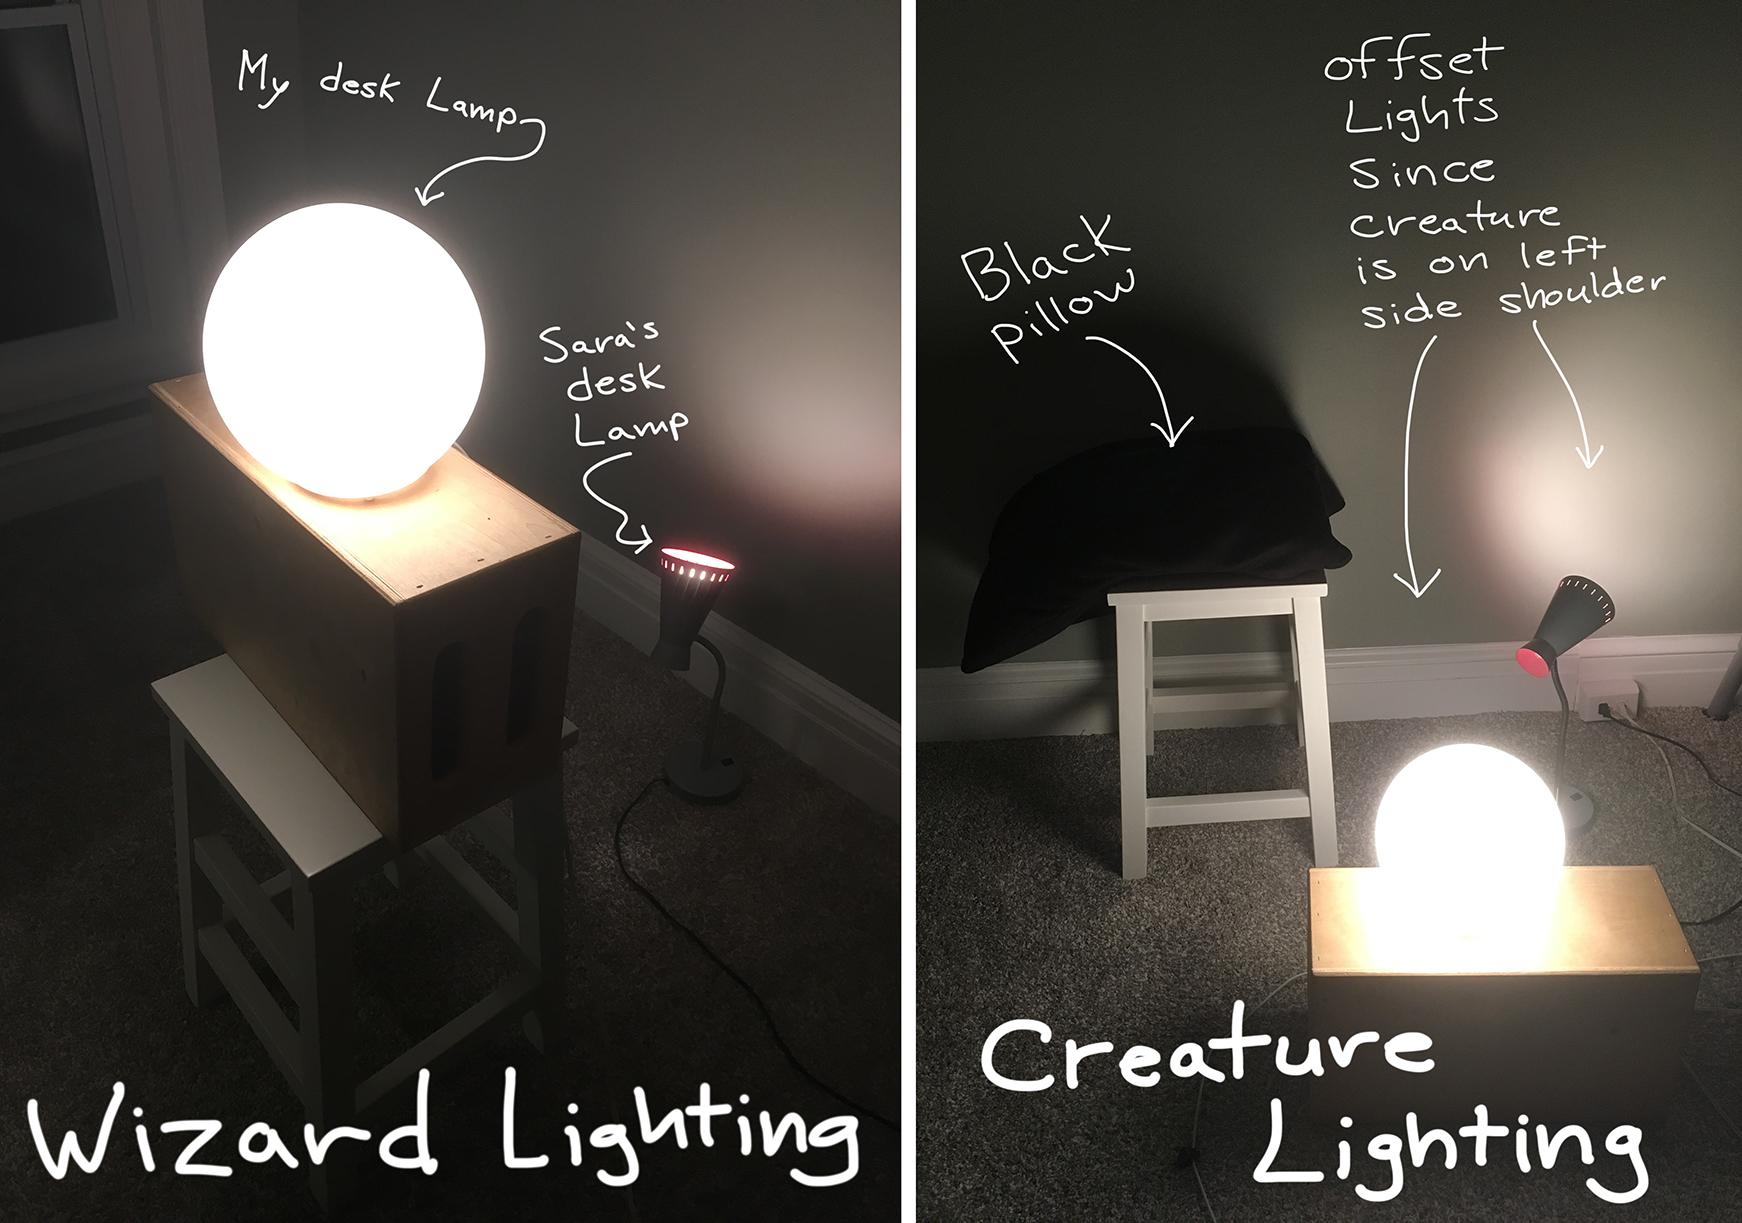 Wizard Lighting